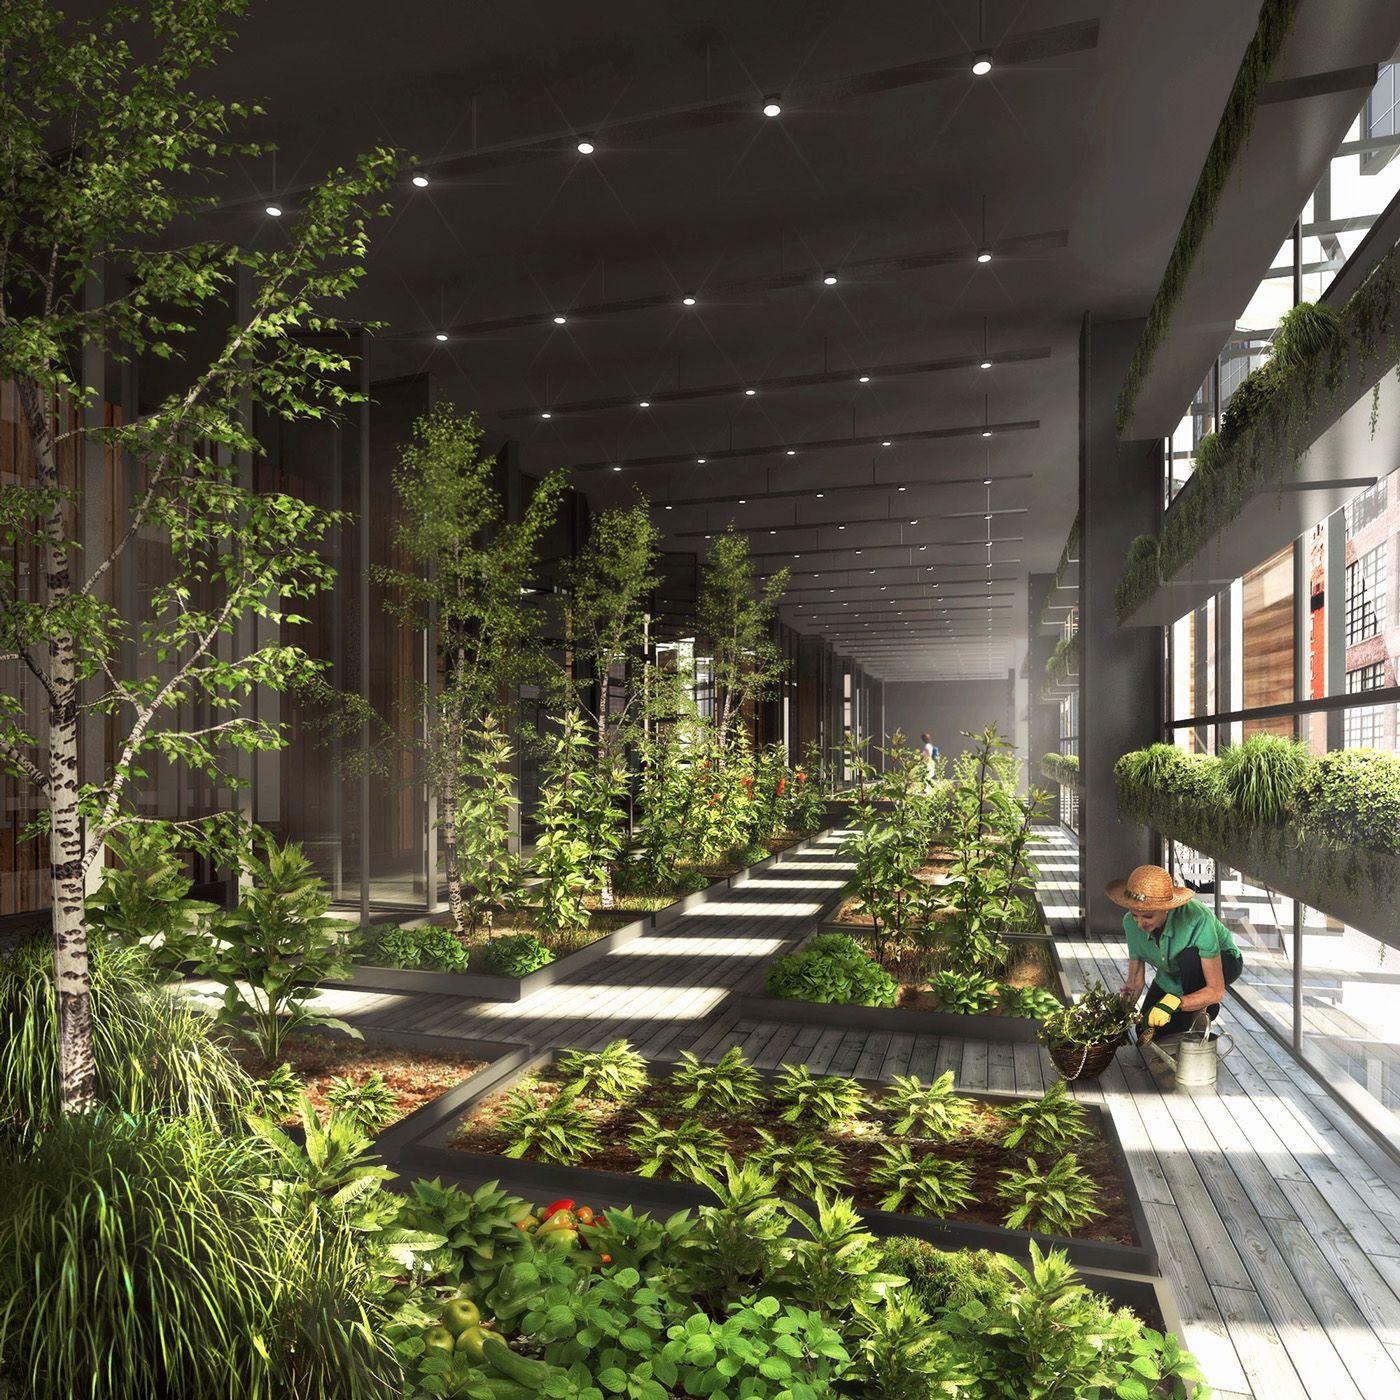 // New York City Vertical Farm by Natural Light Design ...